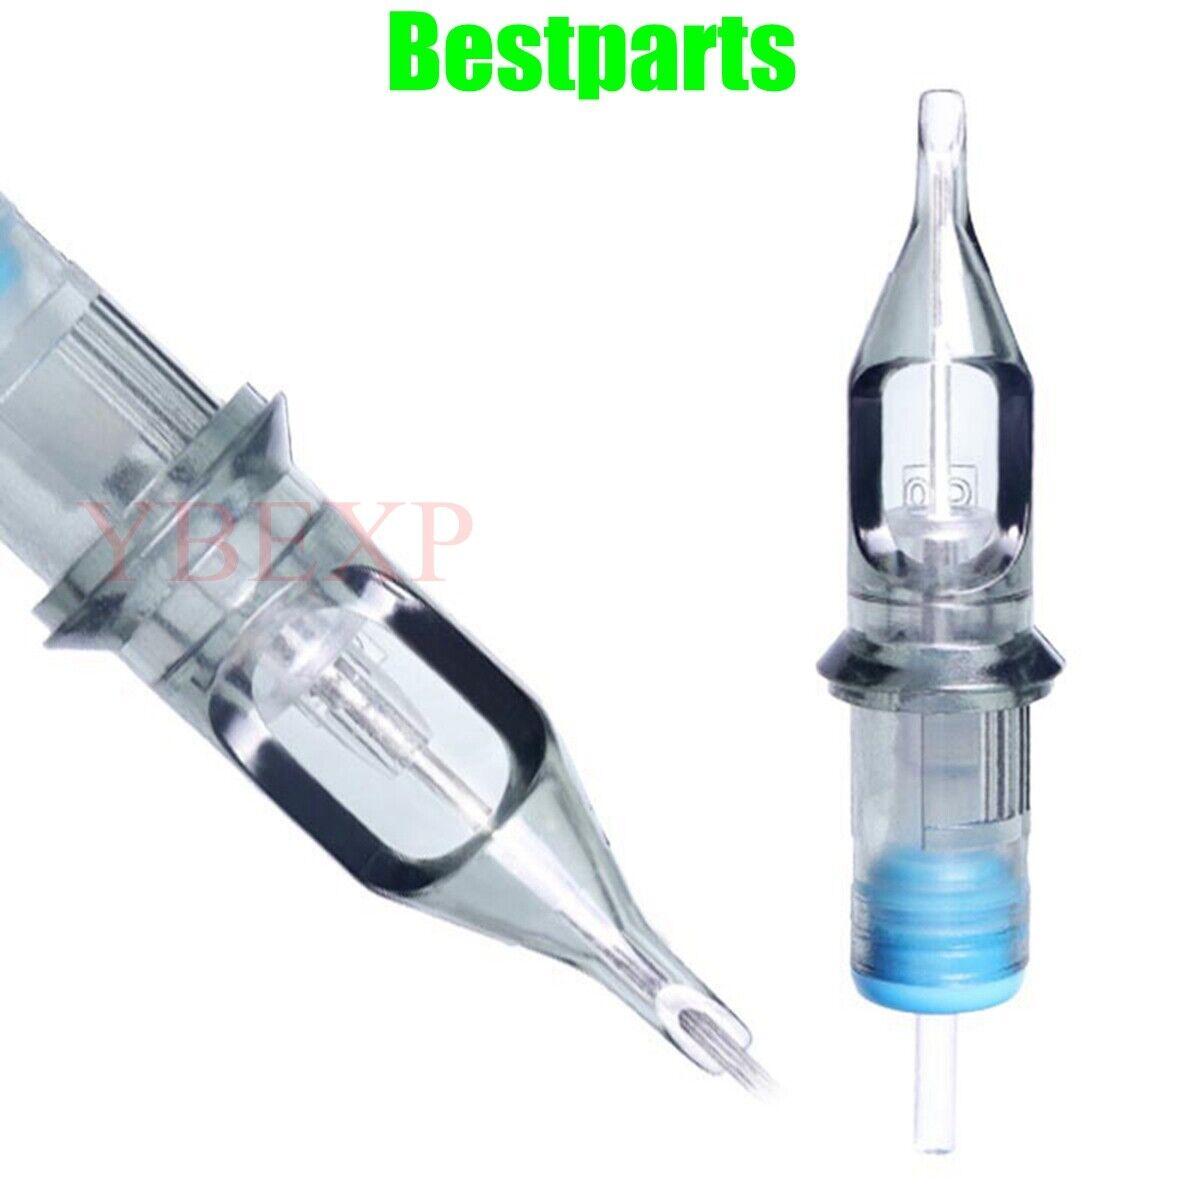 как выглядит 10/20pcs Disposable Tattoo Needle Cartridges Sterilized Round Liner Shaders US фото